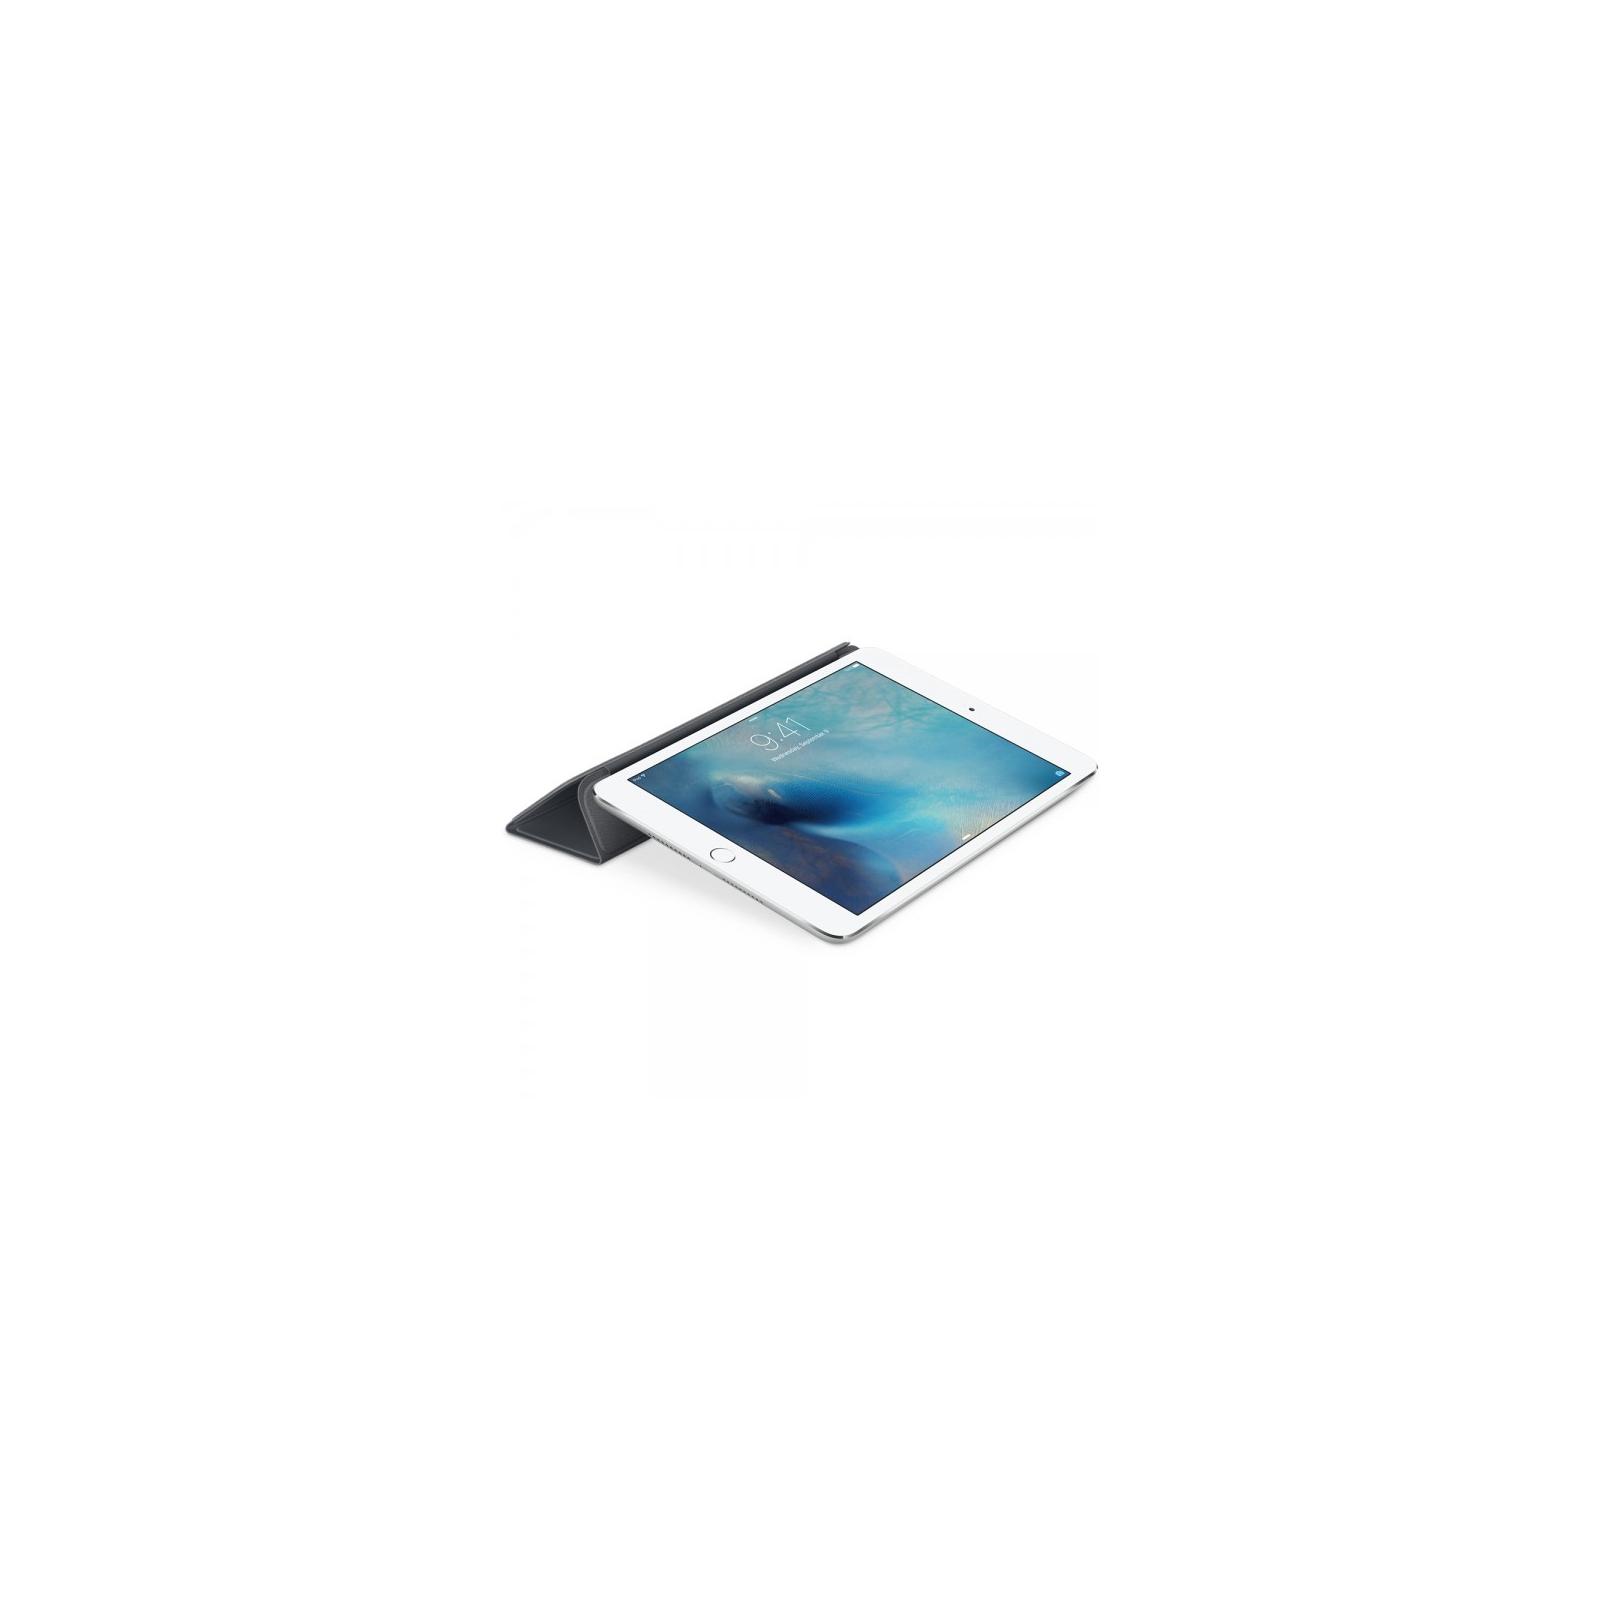 Чехол для планшета Apple Smart Cover для iPad mini 4 Charcoal Gray (MKLV2ZM/A) изображение 4